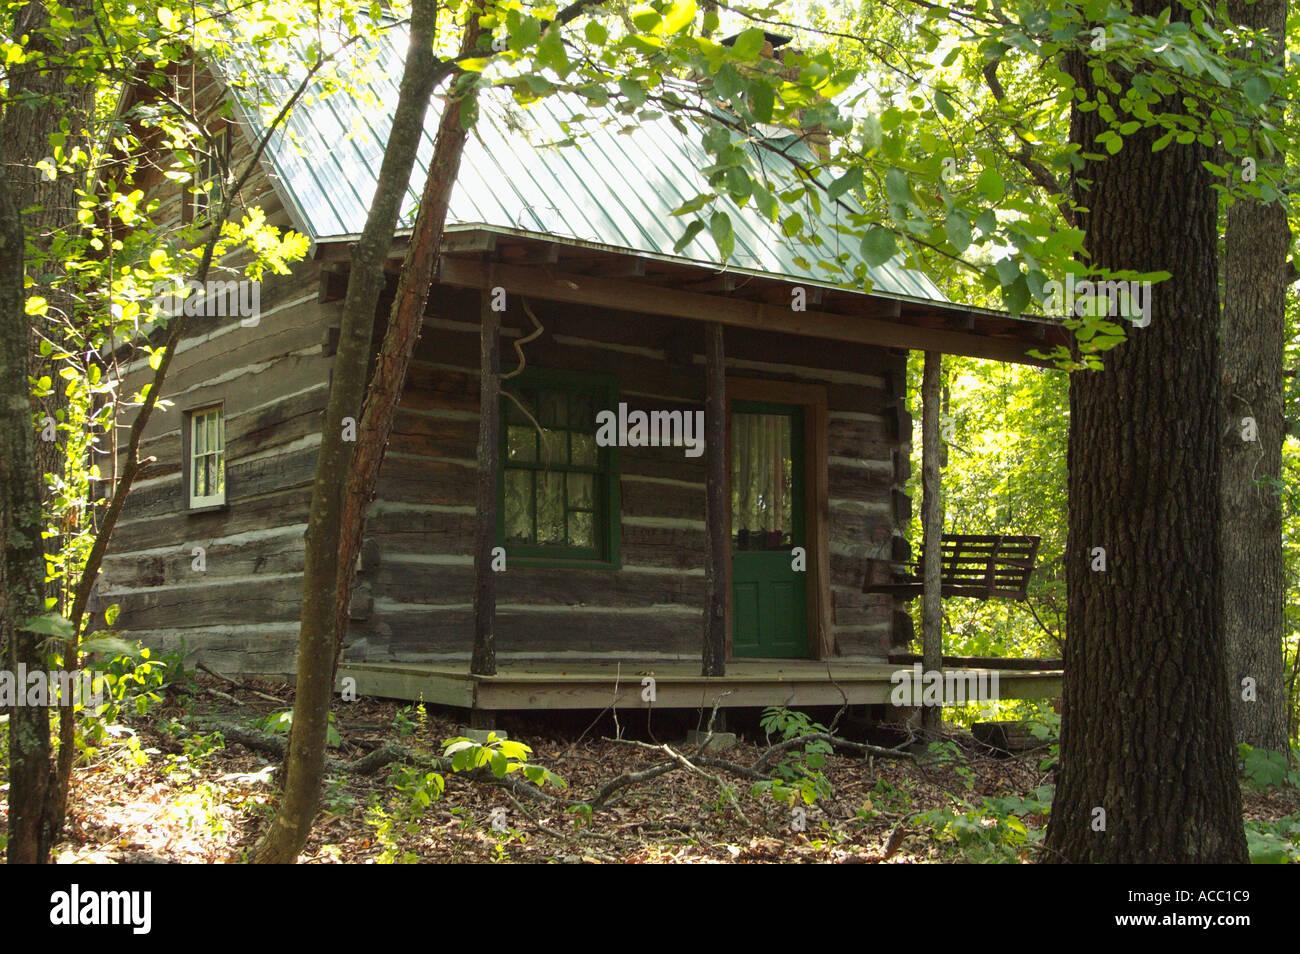 arkansas forest lm waterfront lake beaver house cabin river in green springs kings eureka property huntsville berryville armlsar ar cabins